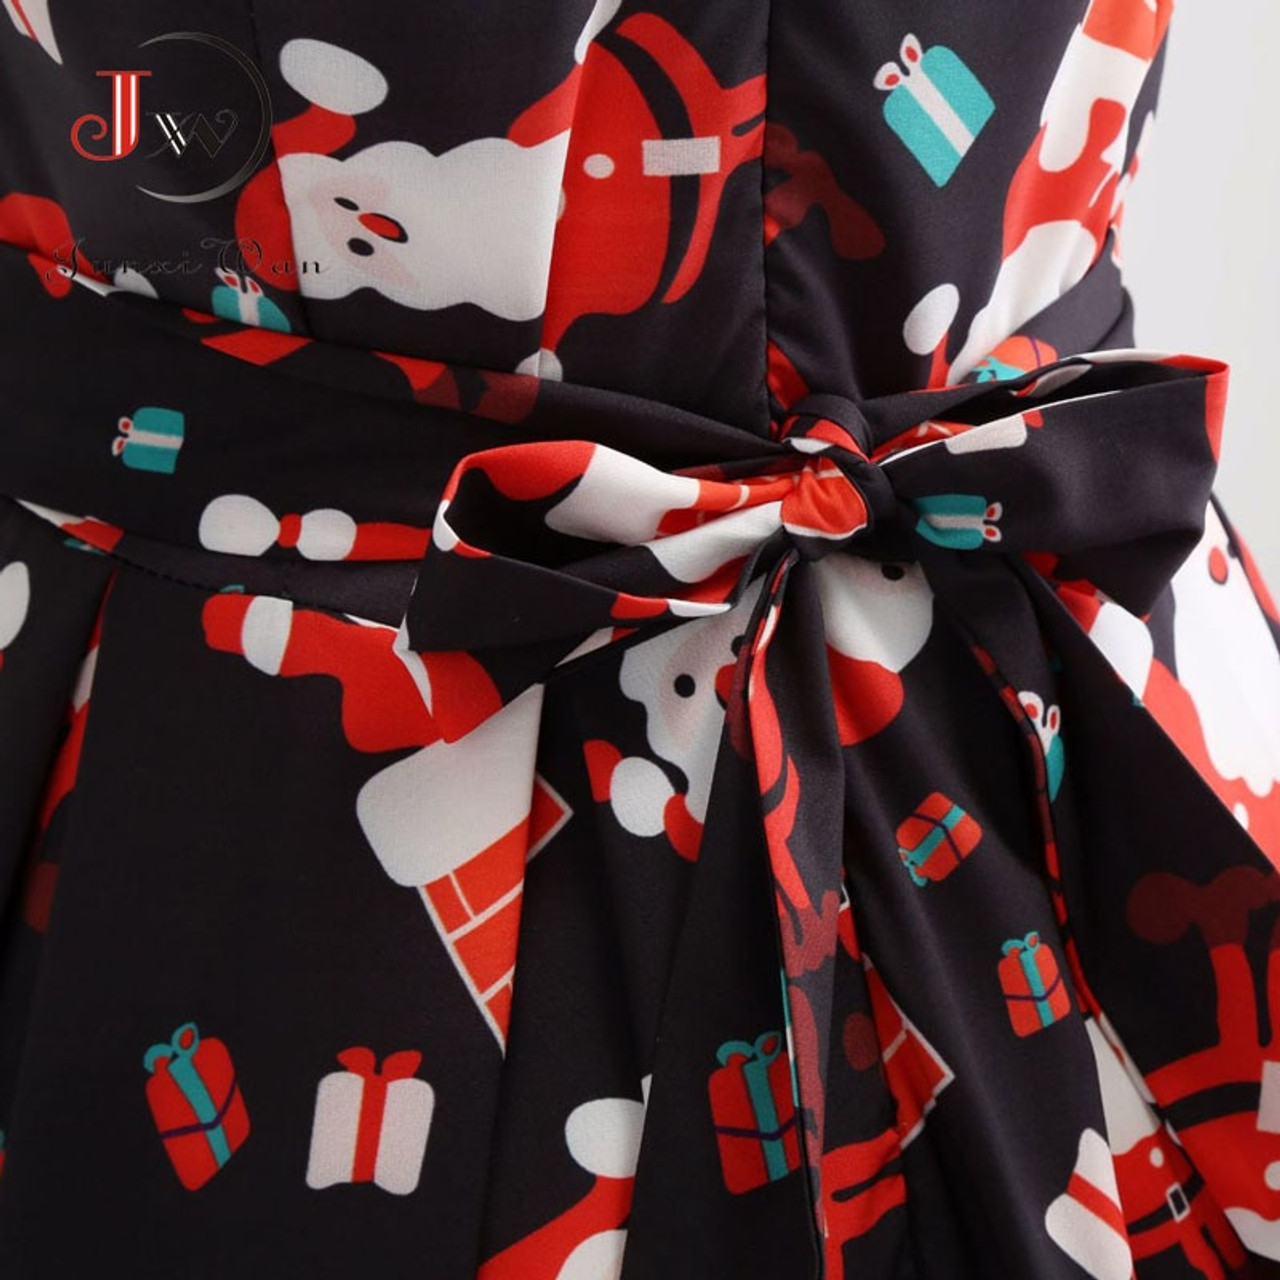 c94b6d501f Vintage Dresses Women Casual Elegant Office Work Red Christmas Dress Retro  Hepburn O-neck Sleeveless Swing Party Dress Plus Size